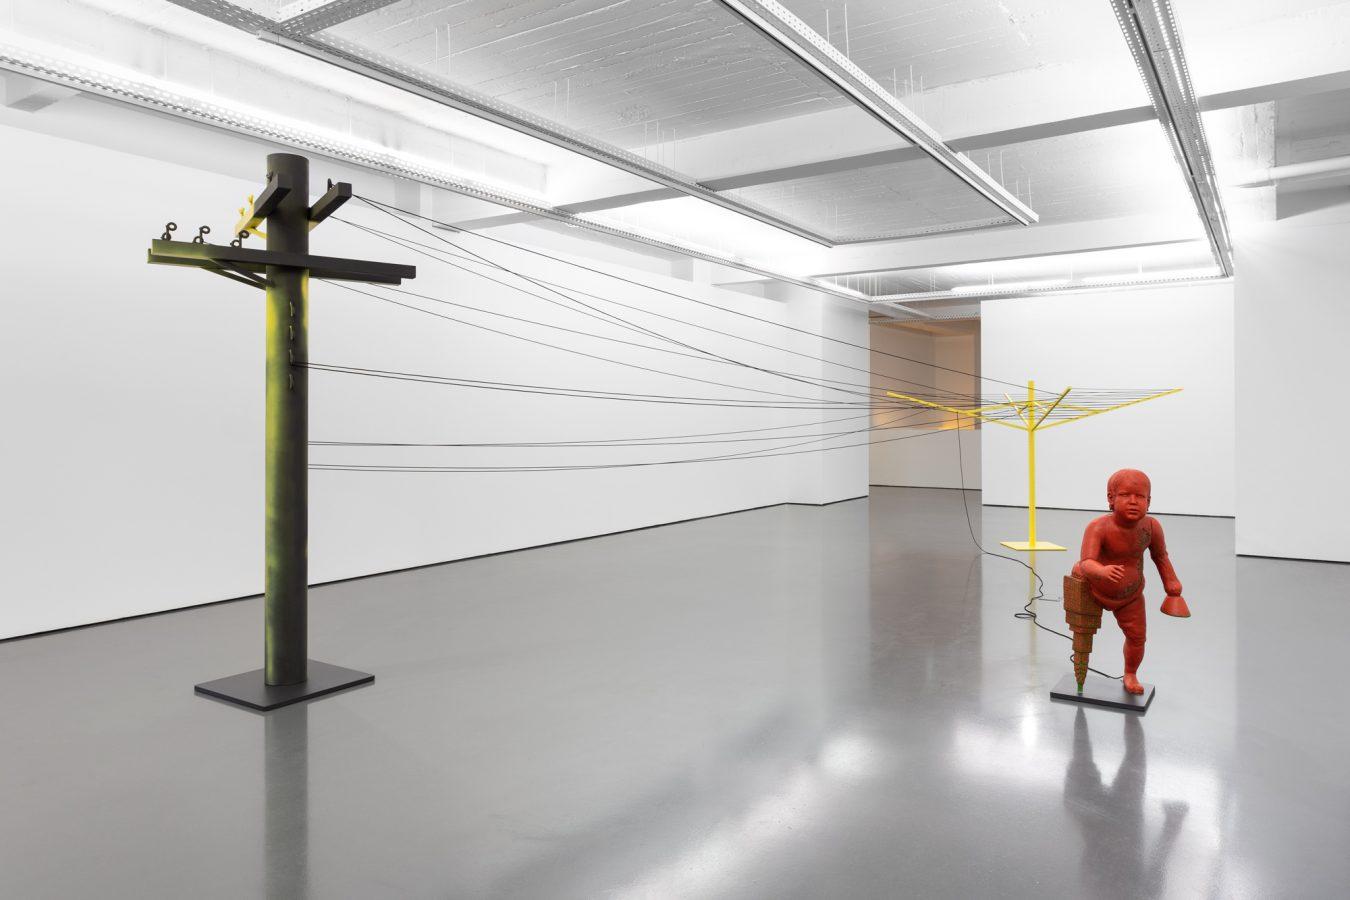 Galeria Pedro Cera – Lena Henke - Ice to Gas